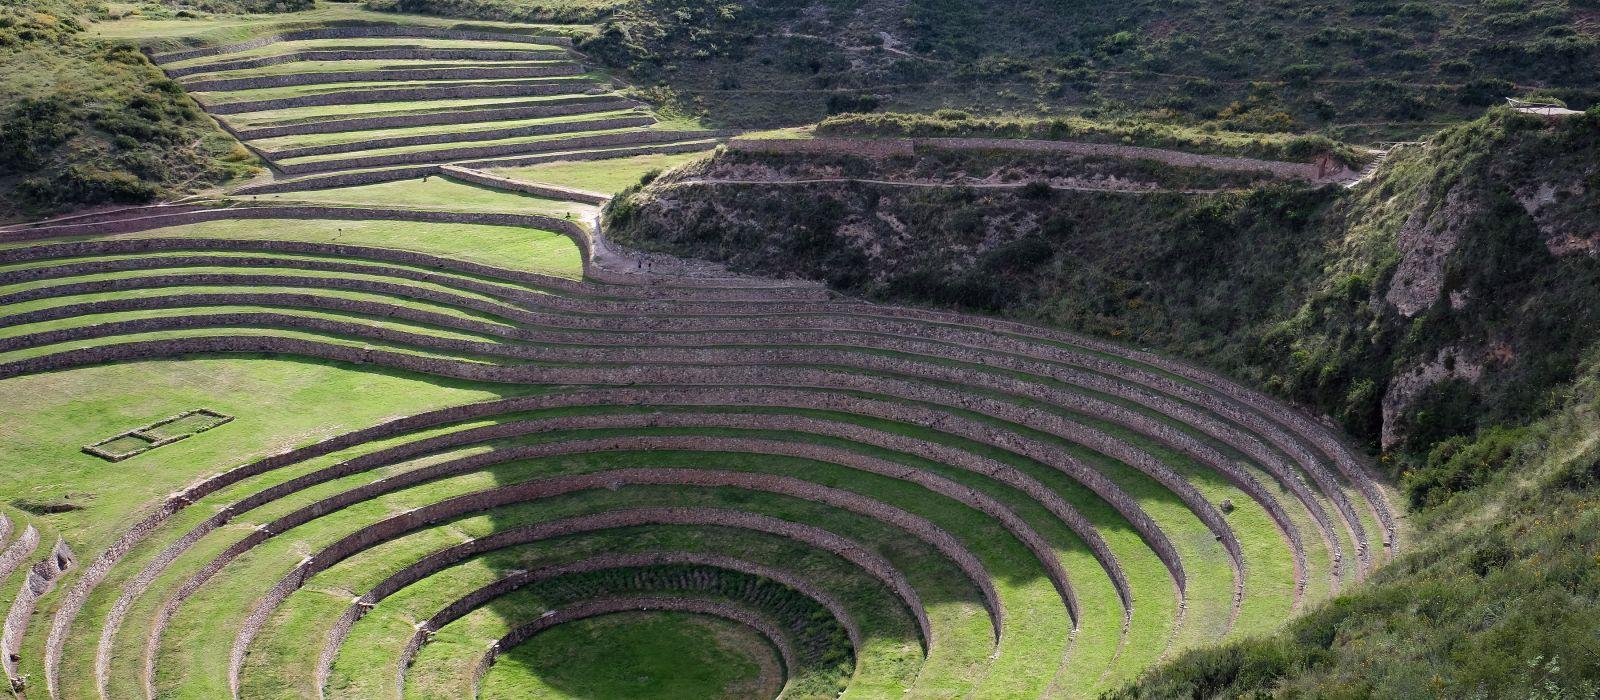 Inca's knowledge. Moray, Sacred Valley, Cusco, Peru, South America